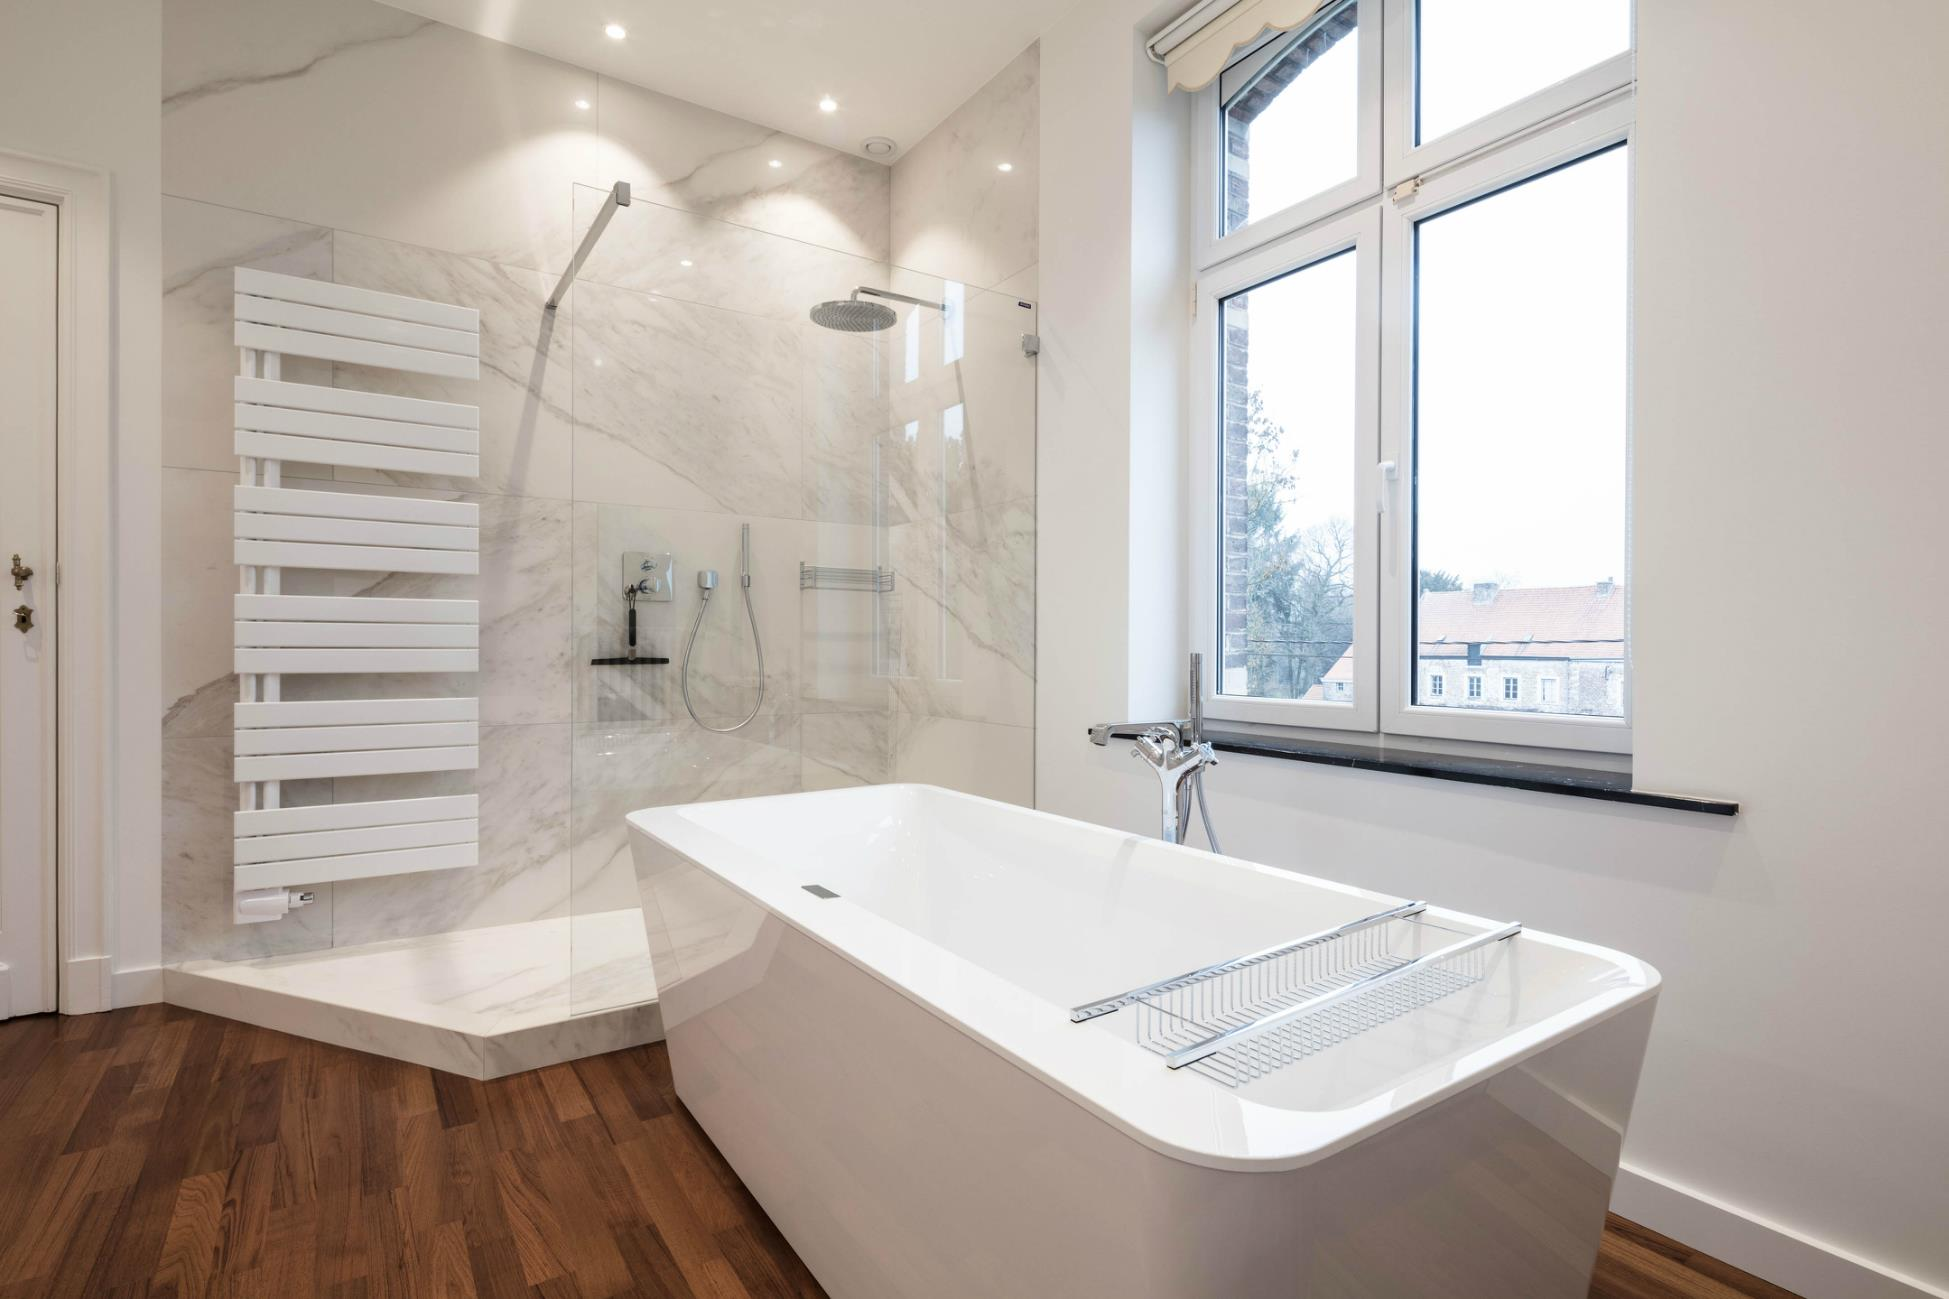 Emejing salle de bain avec parquet contemporary - Salle de bain parquet ...